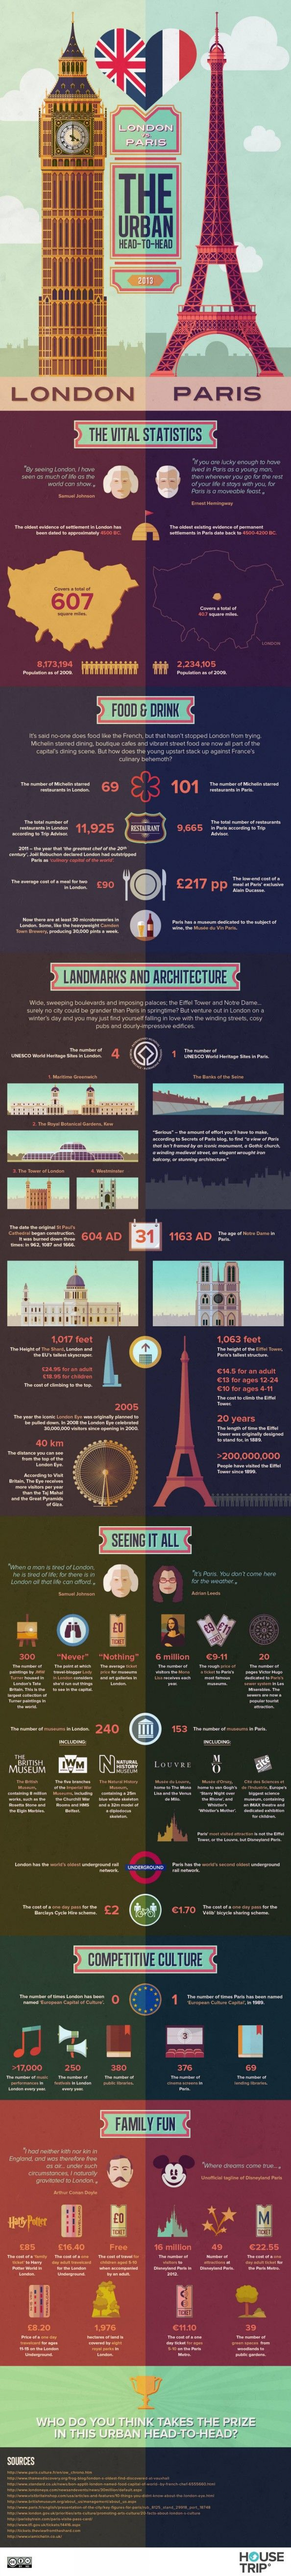 The Urban Head-to-Head: London Vs Paris Infographic